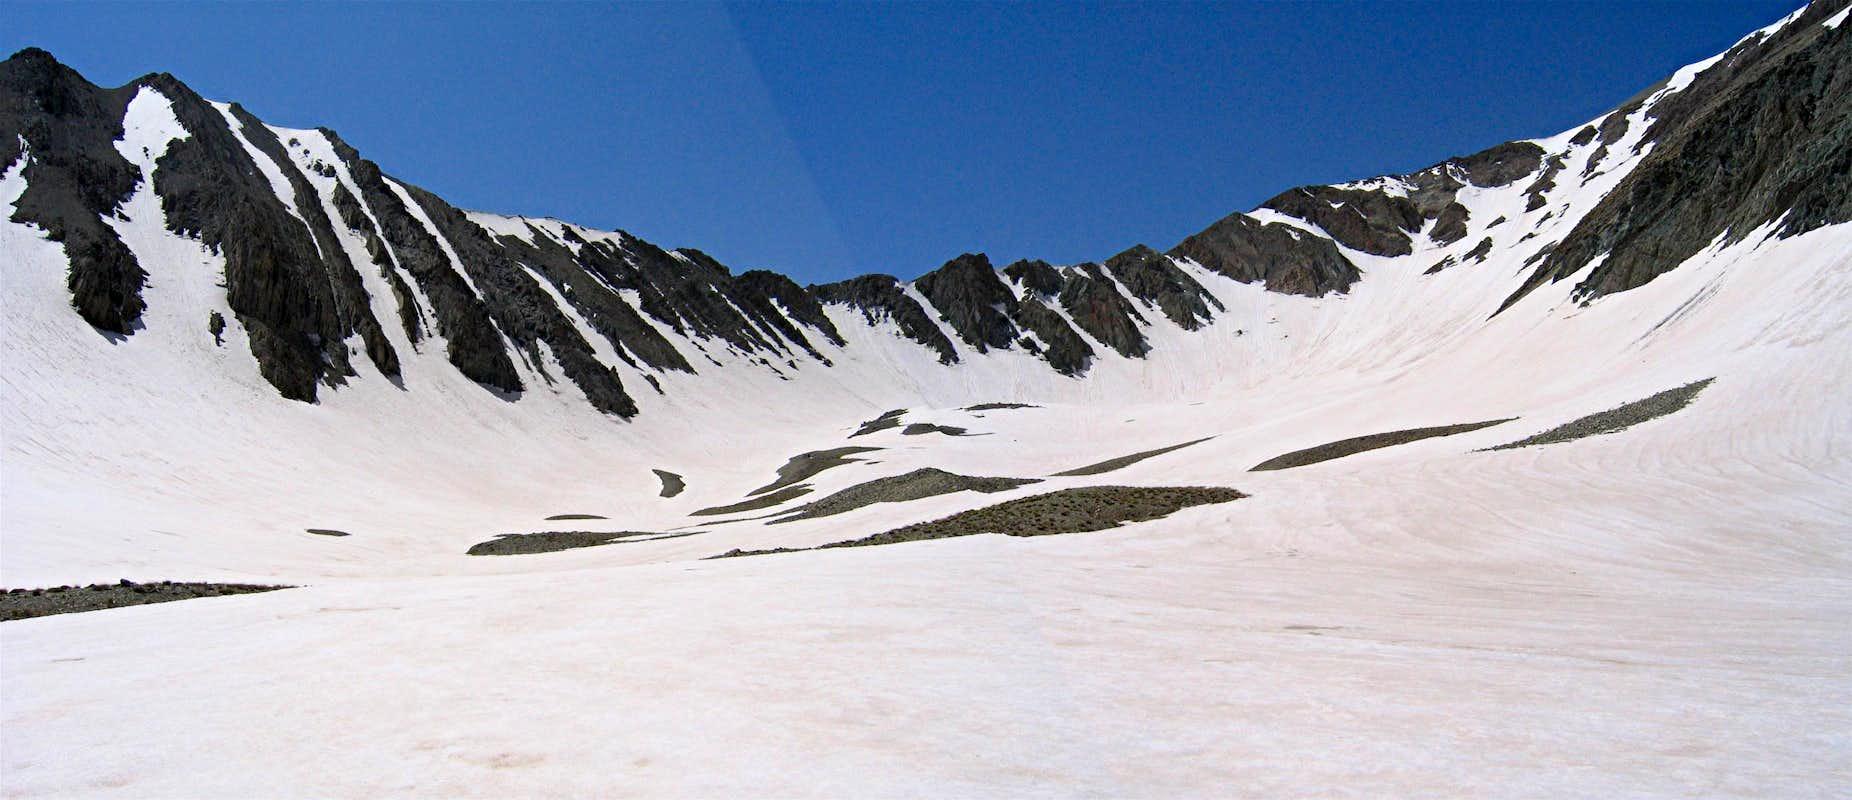 U-Shaped Valley : Photos, Diagrams & Topos : SummitPost